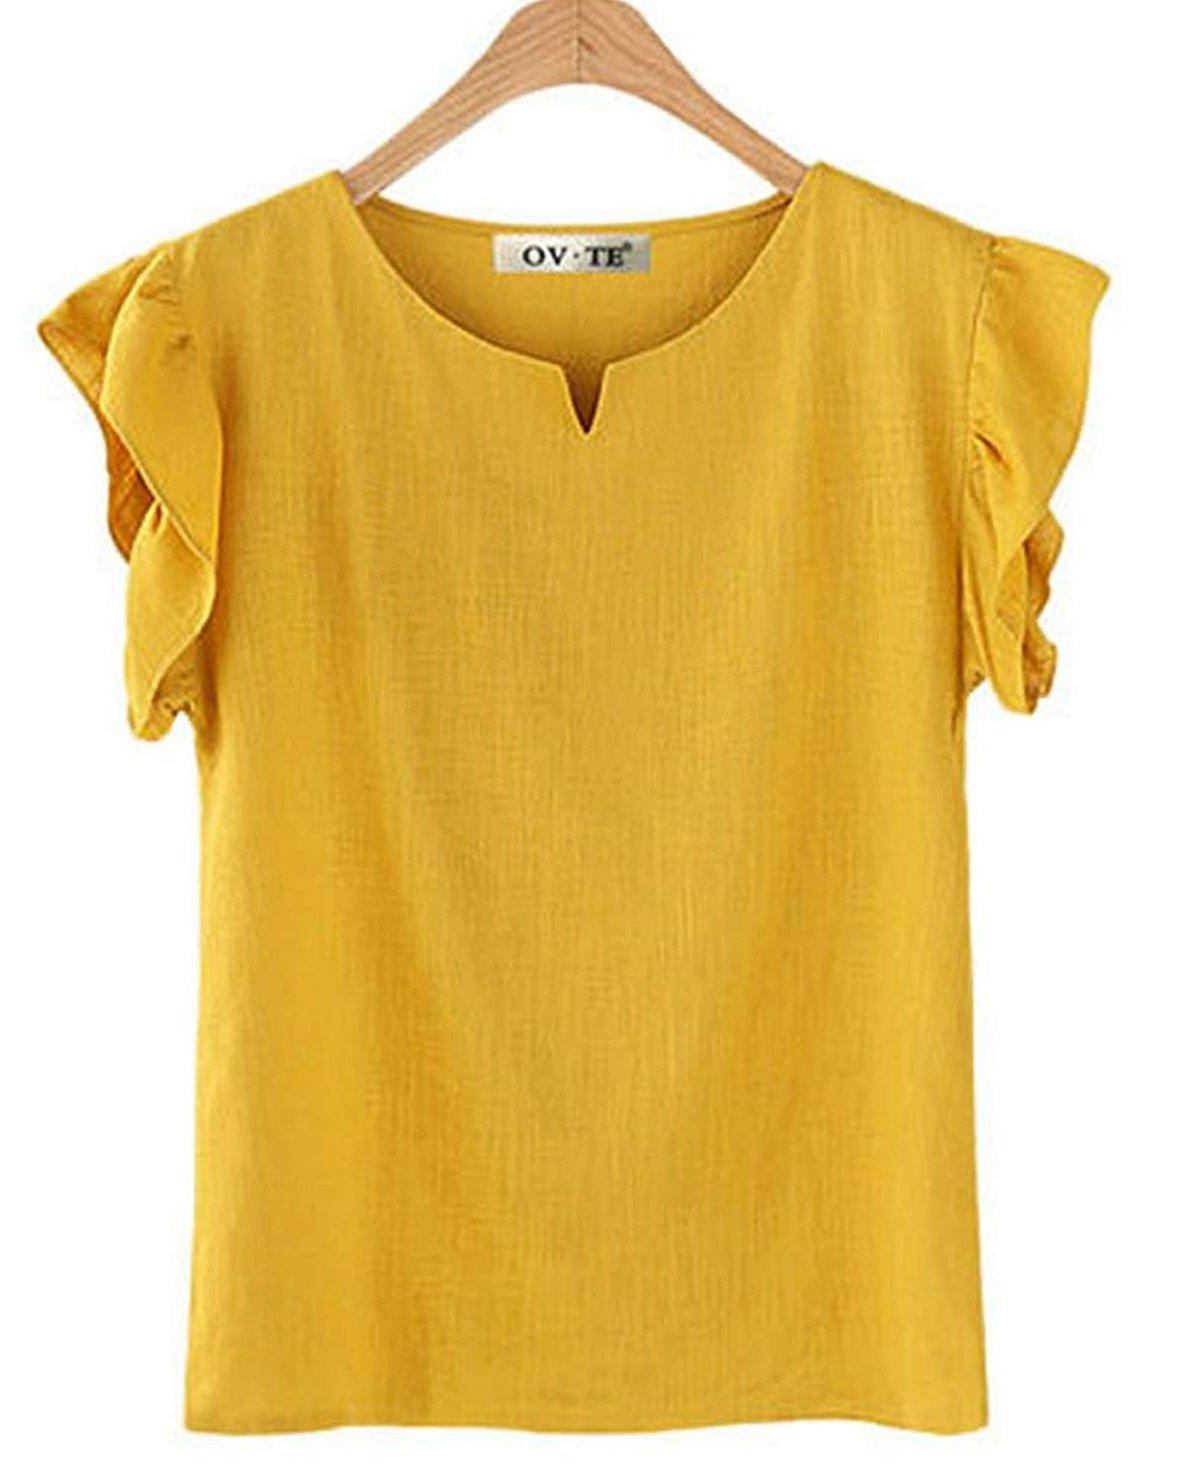 VenuStar Womens T-Shirt Tops Summer Ruffle Short Sleeve Chiffon Blouse (M, B-Yellow)